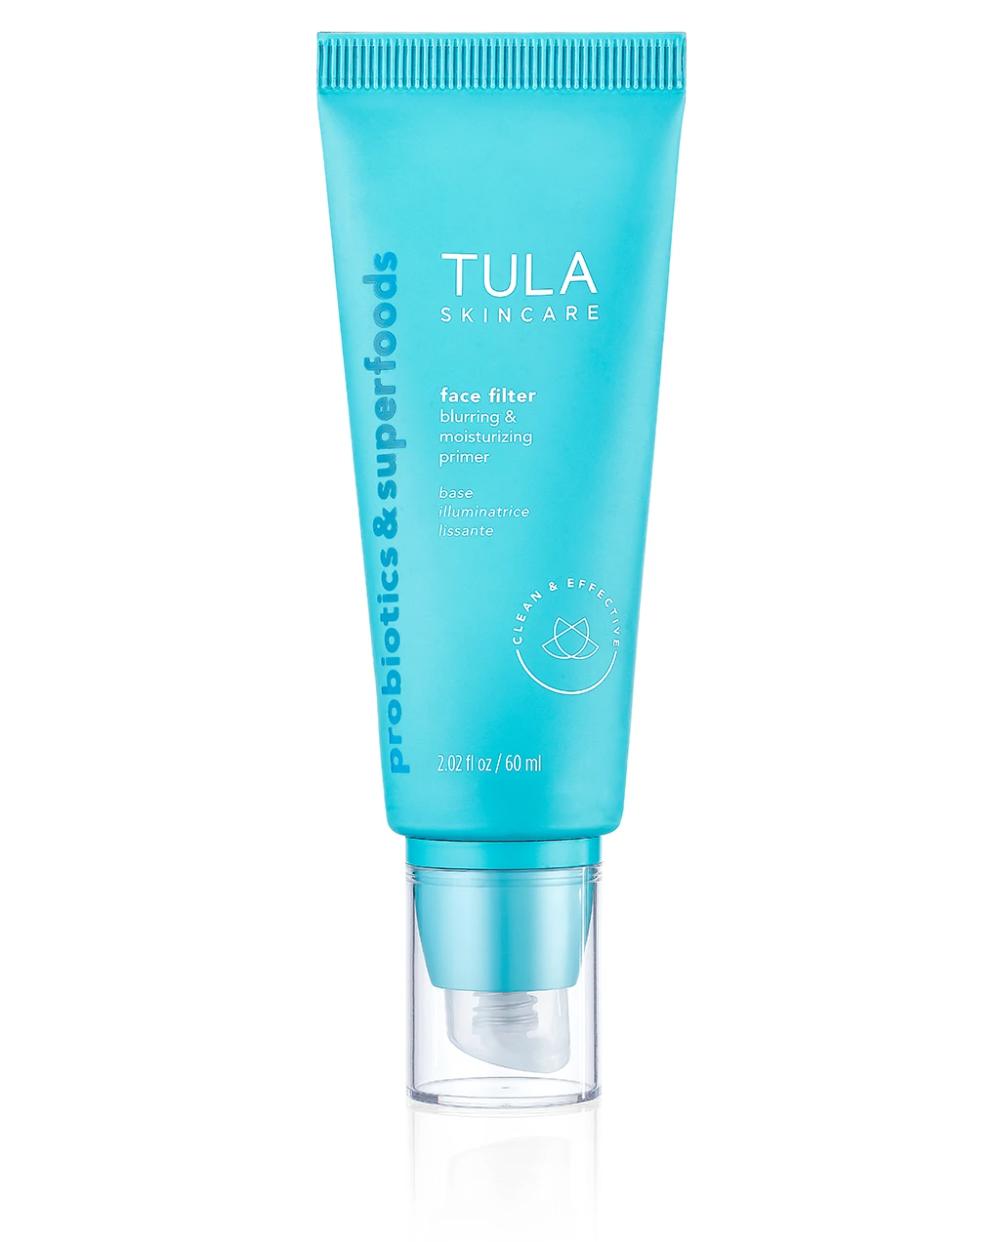 Blurring Moisturizing Primer Supersize In 2020 Face Products Skincare Tula Skincare Skin Care